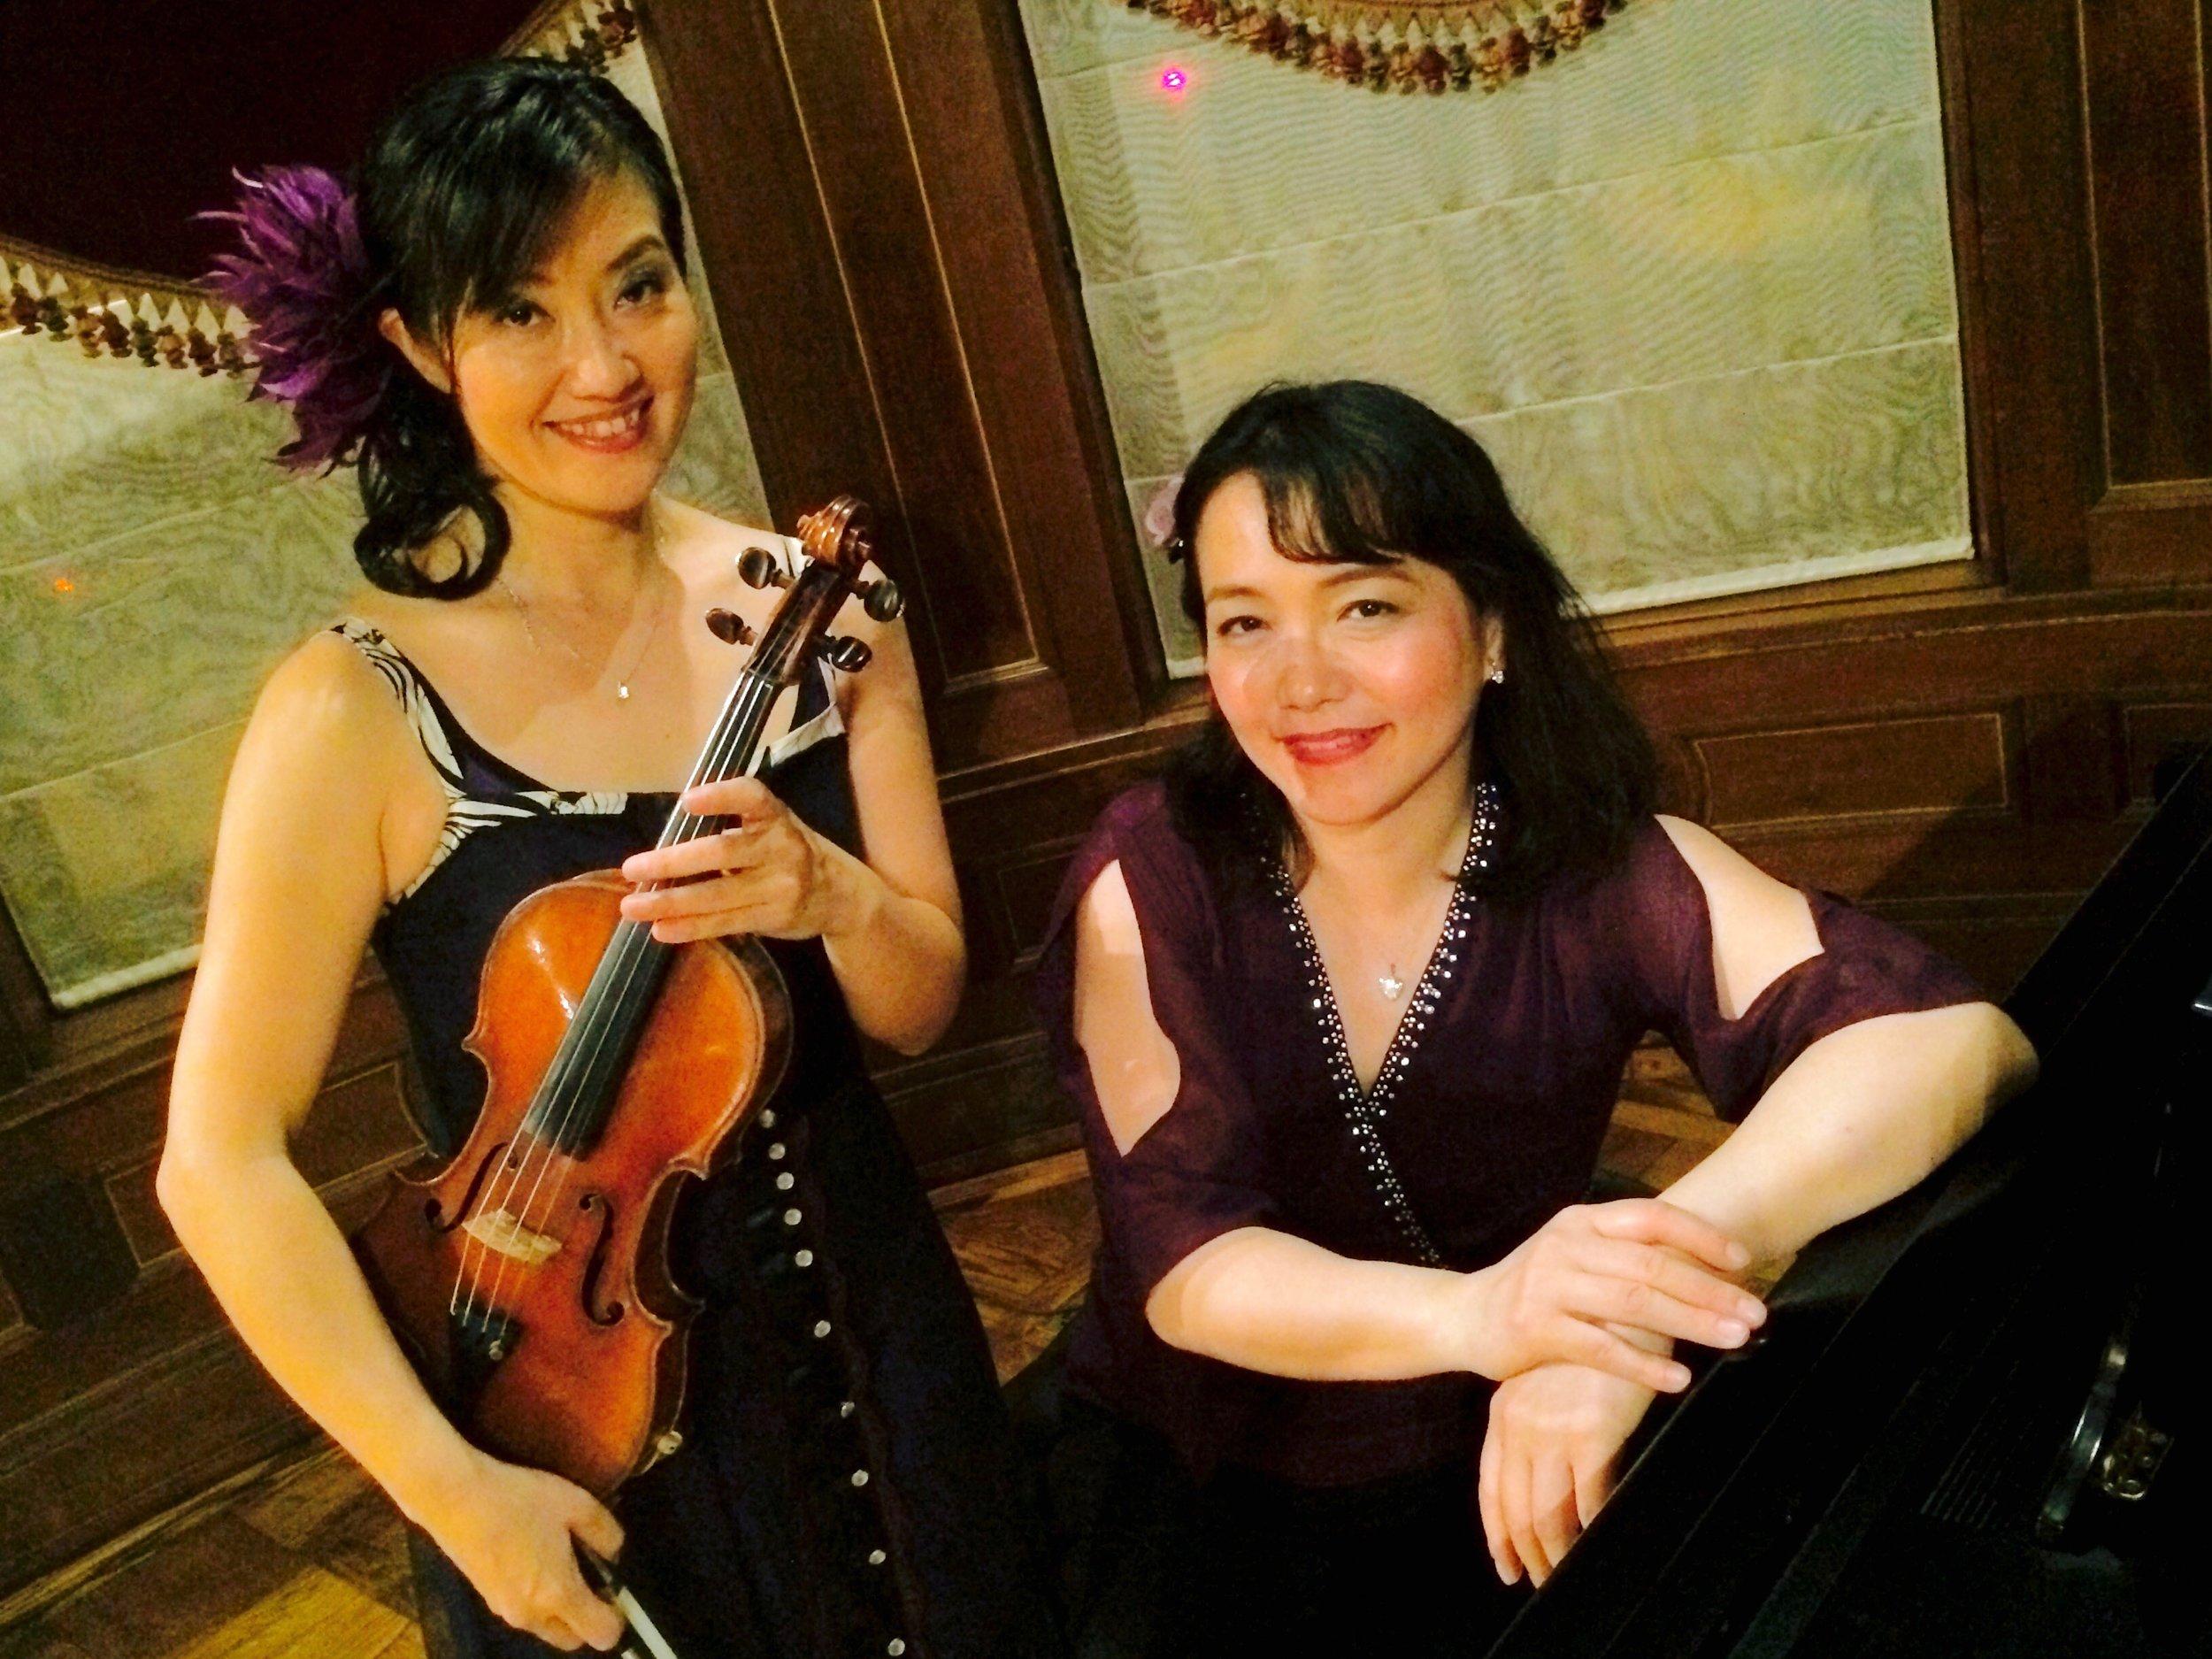 Machiko Ozawa and Ayako Shirasaki after the performance at Turkish Ambassador's Residence in DC in May, 2016